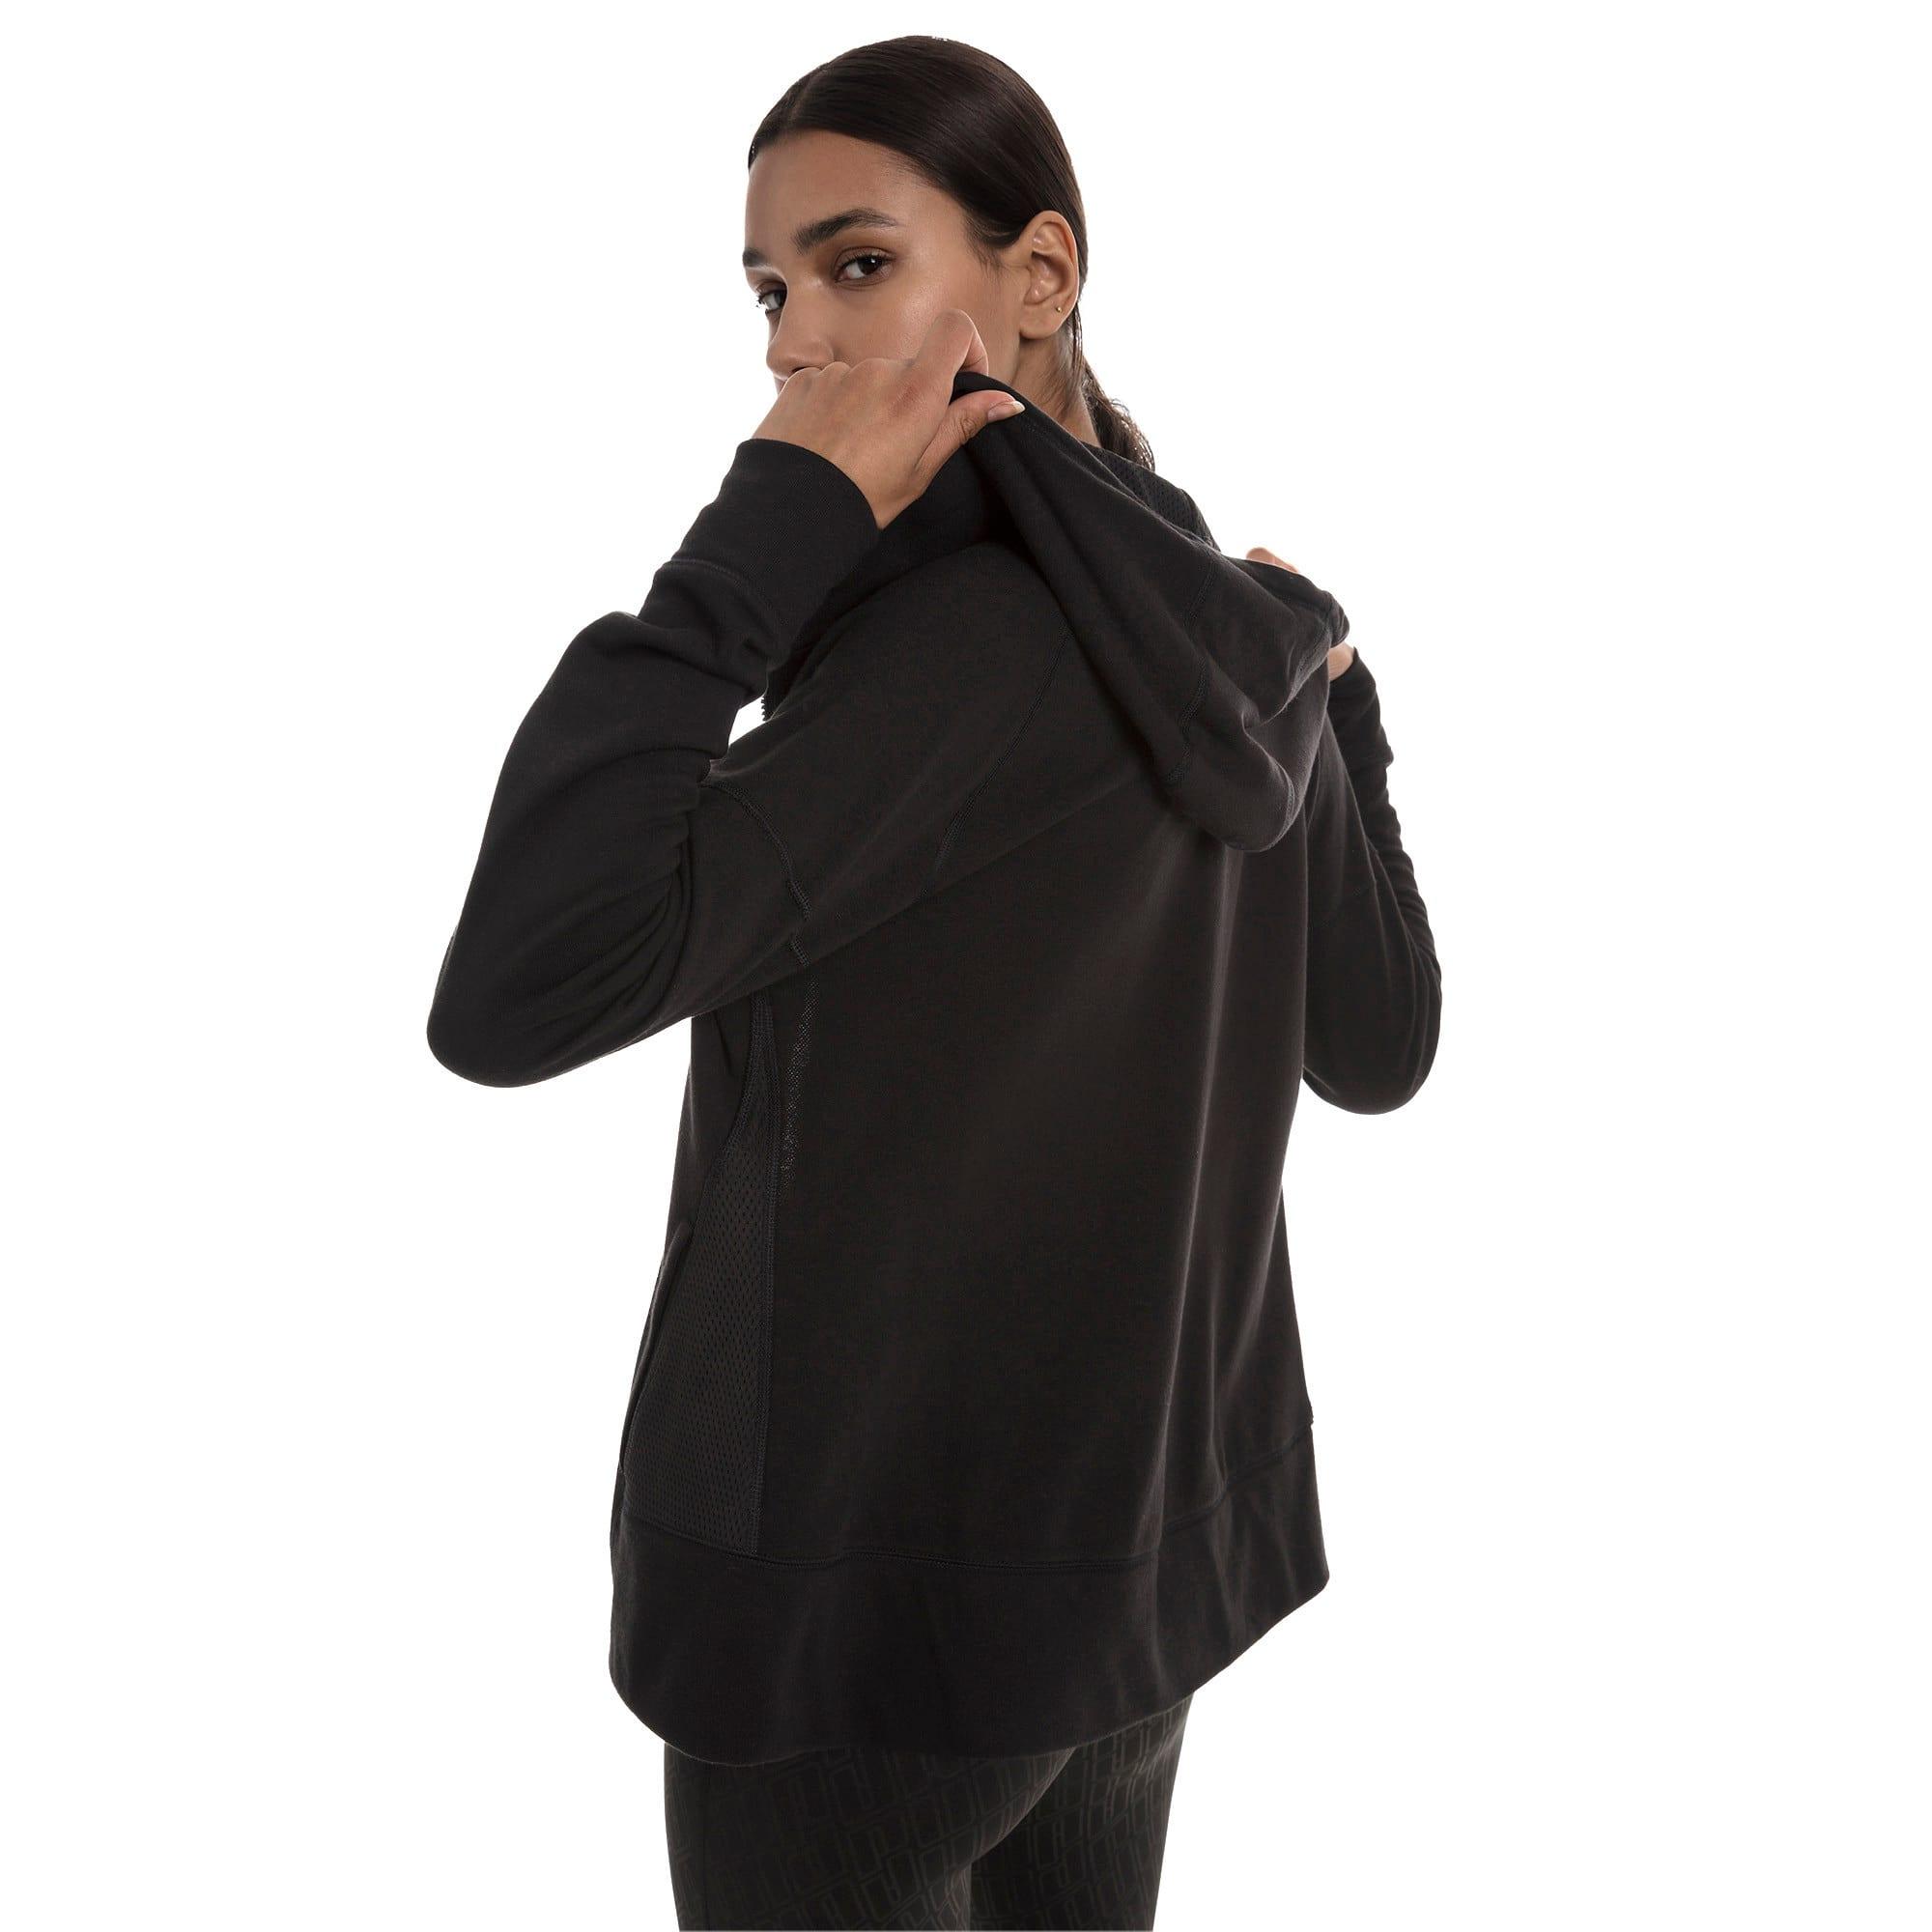 Thumbnail 2 of Yogini Damen Gestrickte Trainingsjacke, Cotton Black, medium